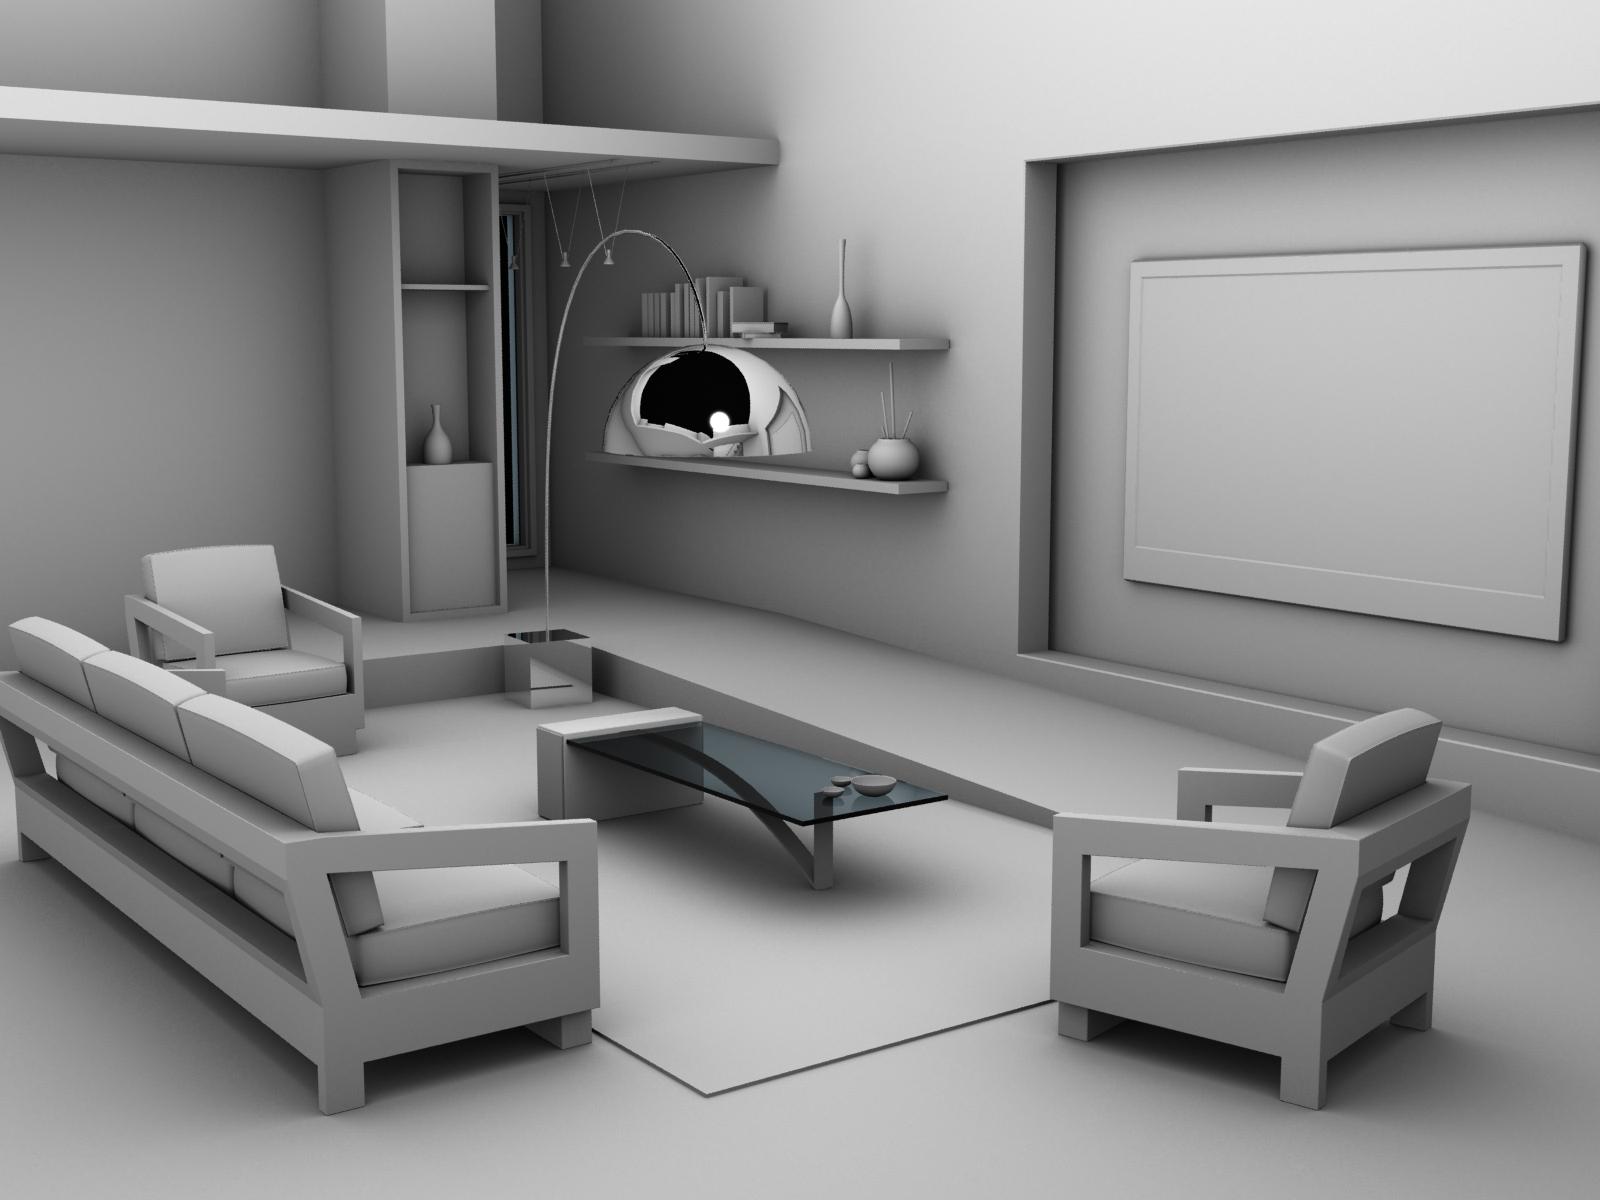 sylvain m 3d high resolution temps r el wip design d 39 int rieur. Black Bedroom Furniture Sets. Home Design Ideas